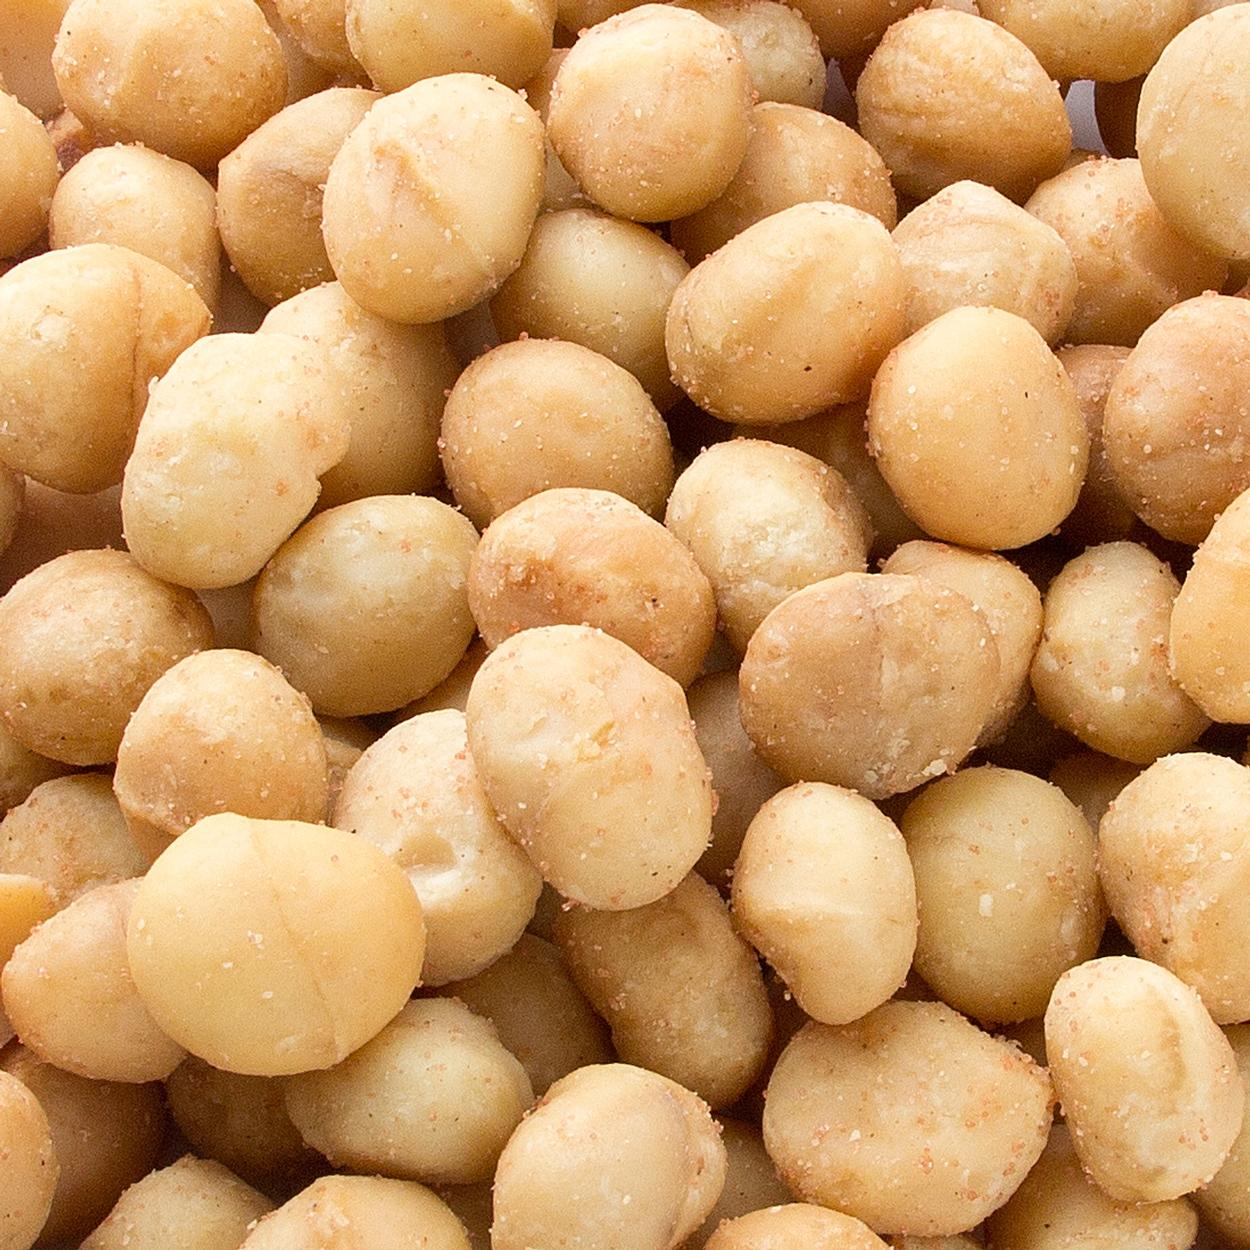 Bulk Macadamia Nuts • Buy Macadamias in Bulk By The Pound • Oh! Nuts®